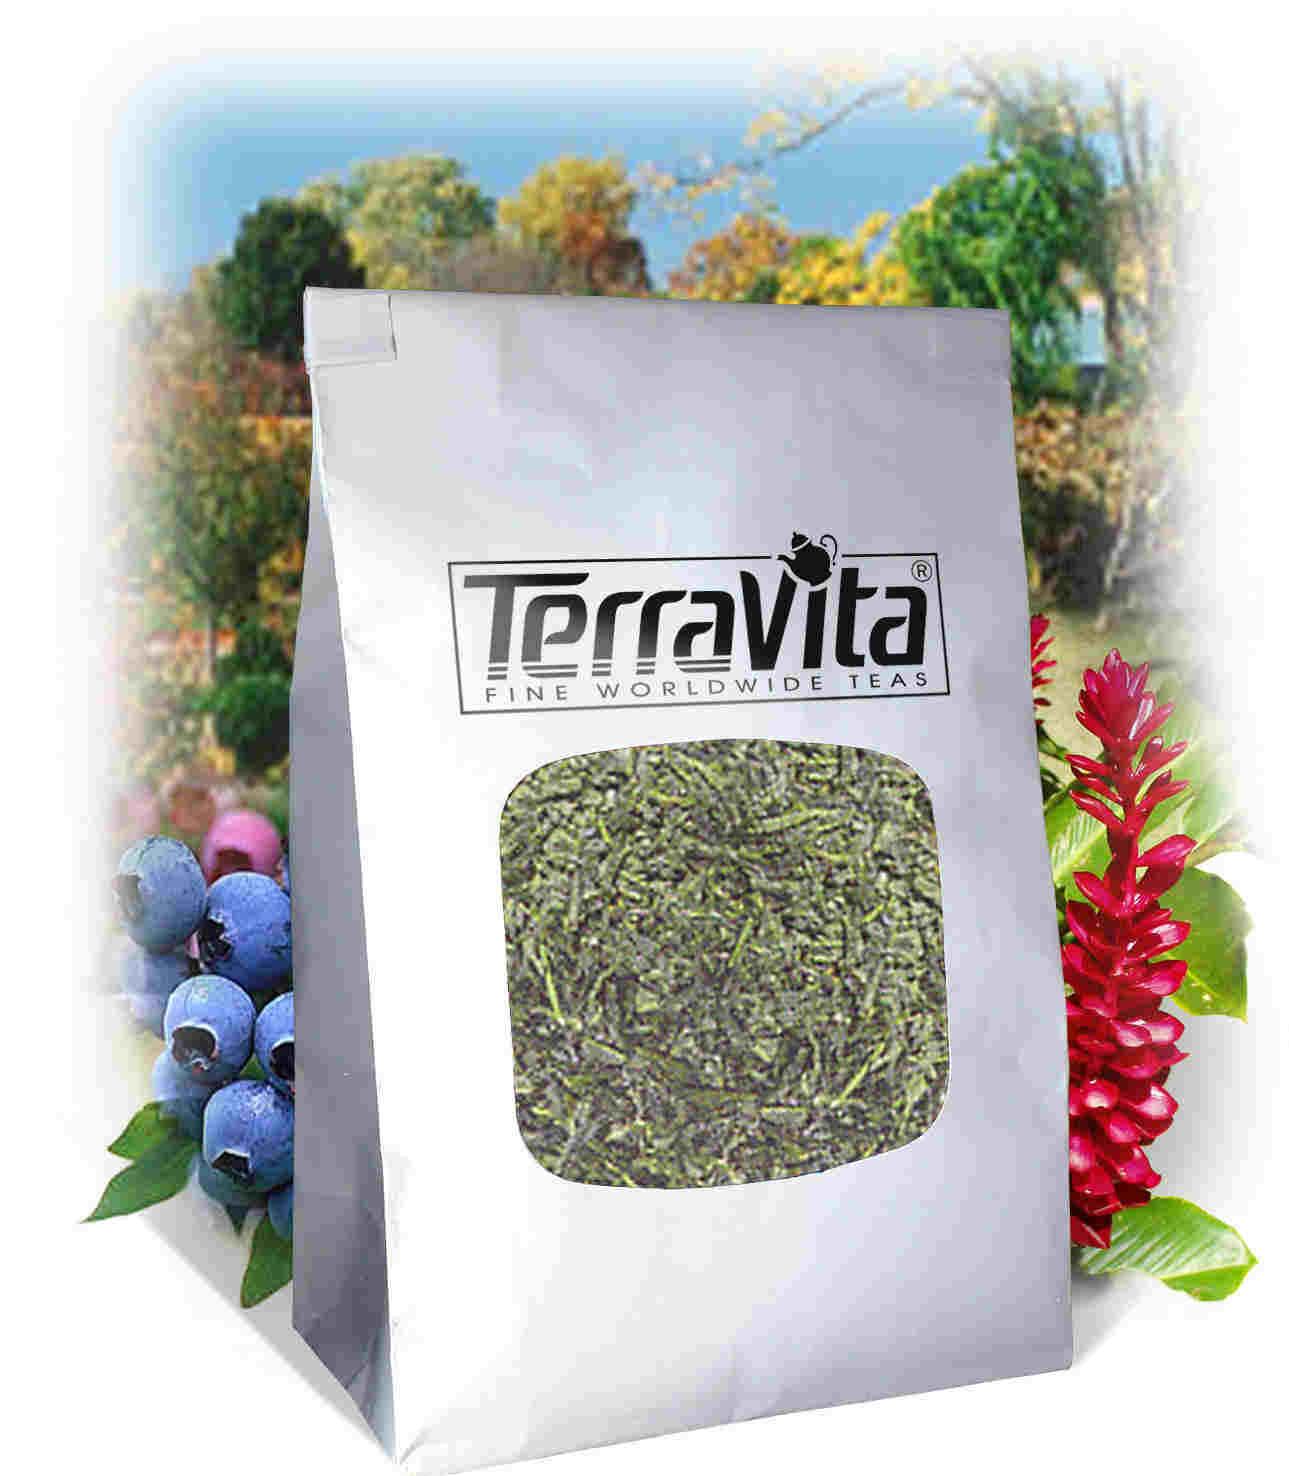 Urinary Tract Maintenance Complex Tea (Loose) - Uva Ursi, Hyssop, Senna and More